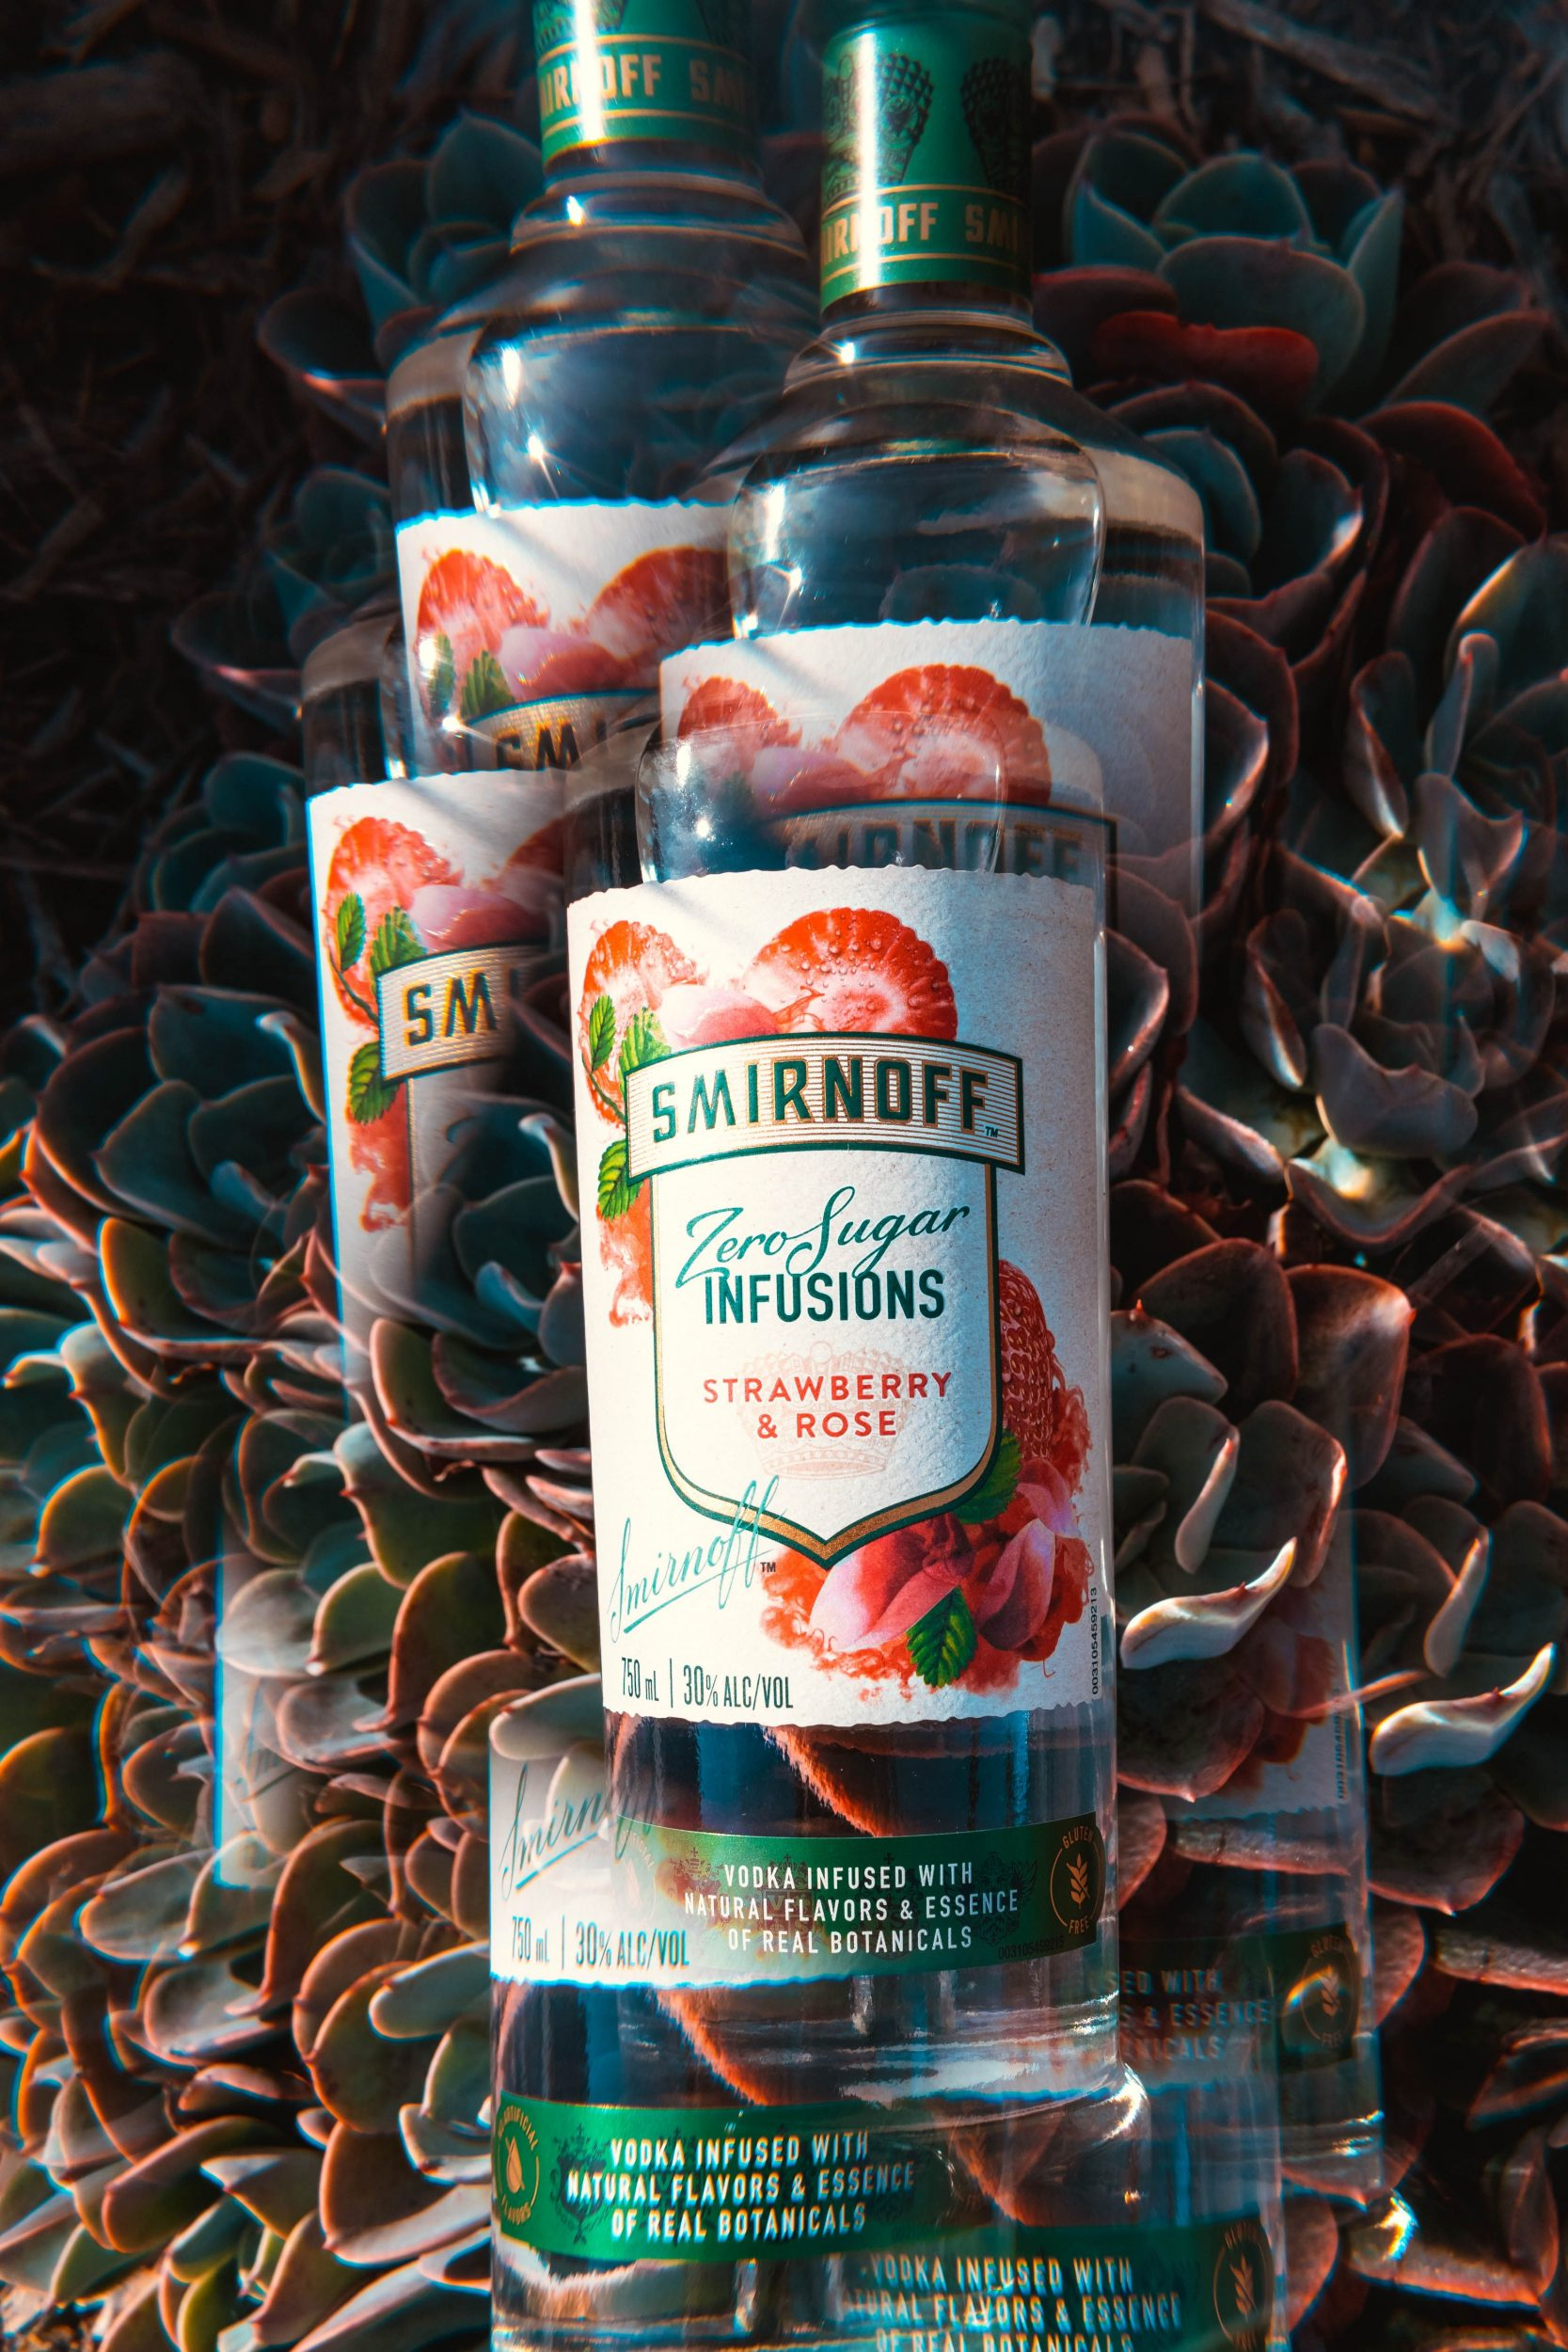 Smirnoff Product